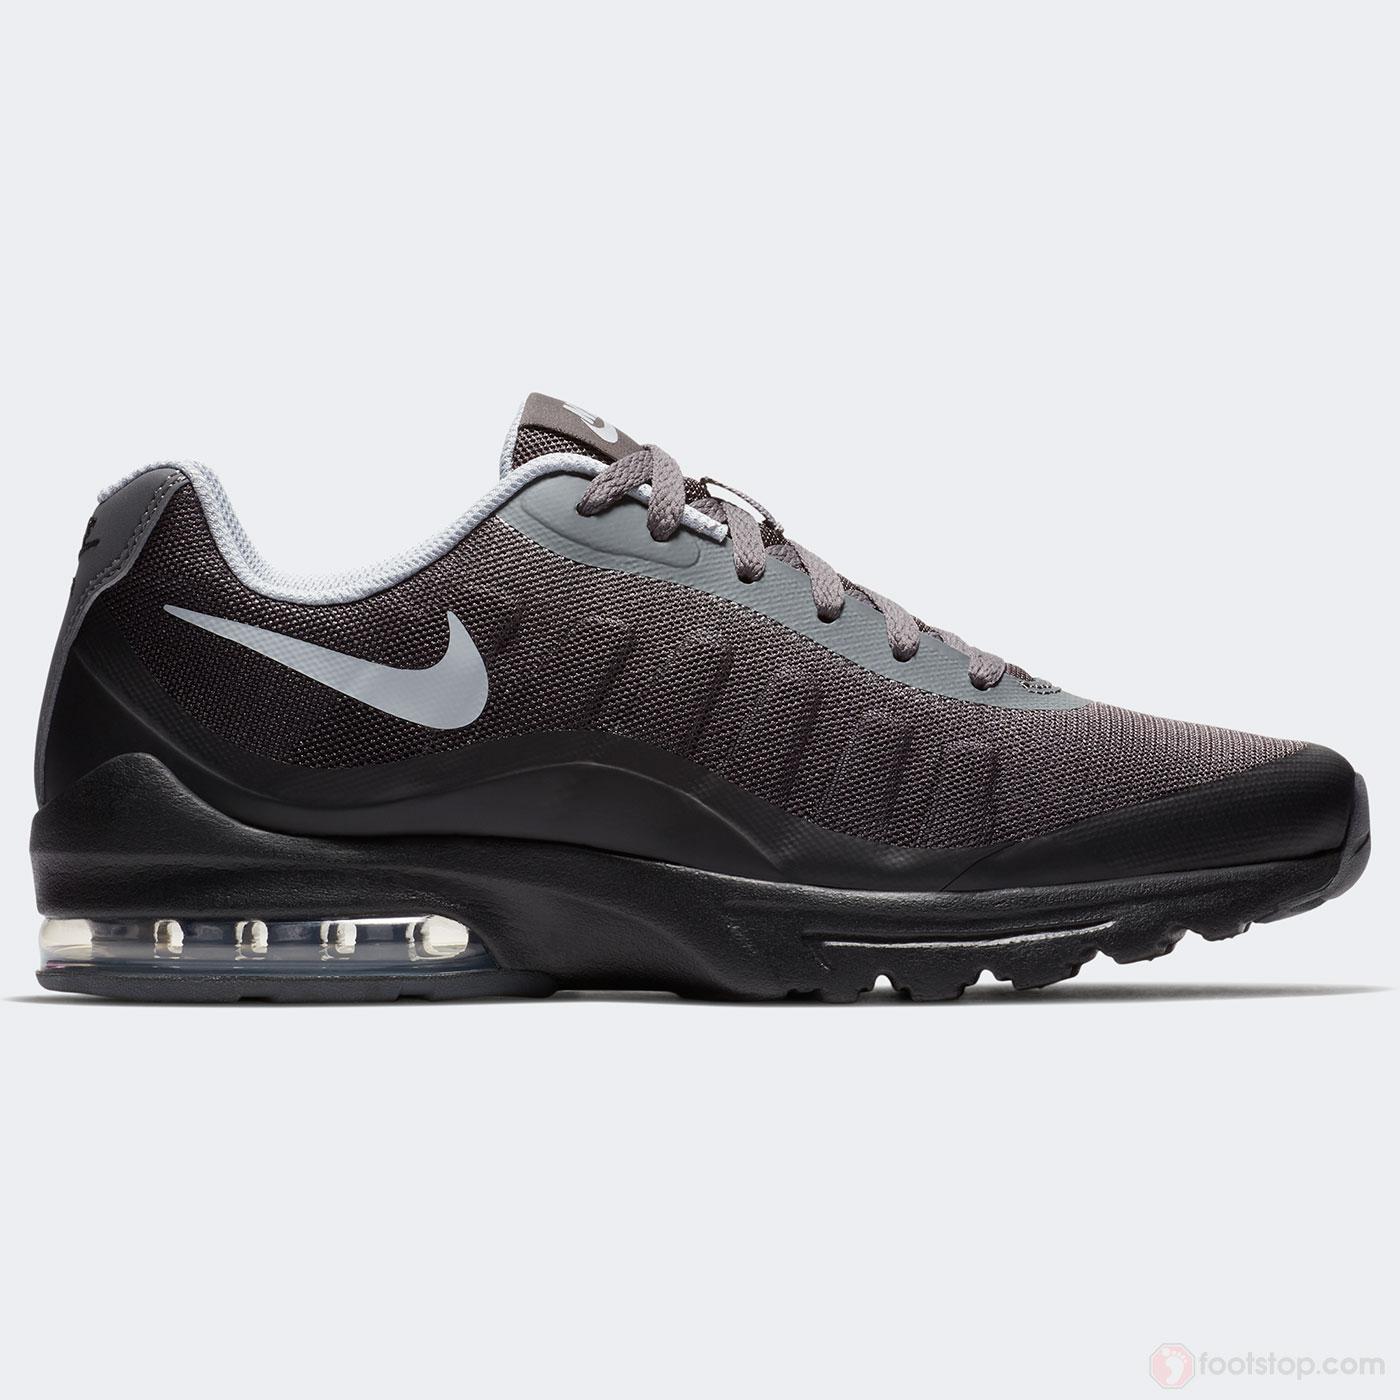 dca6d53111b4c Home Hombre Zapatillas de sportswear hombre. Nike Air Max Invigor ...